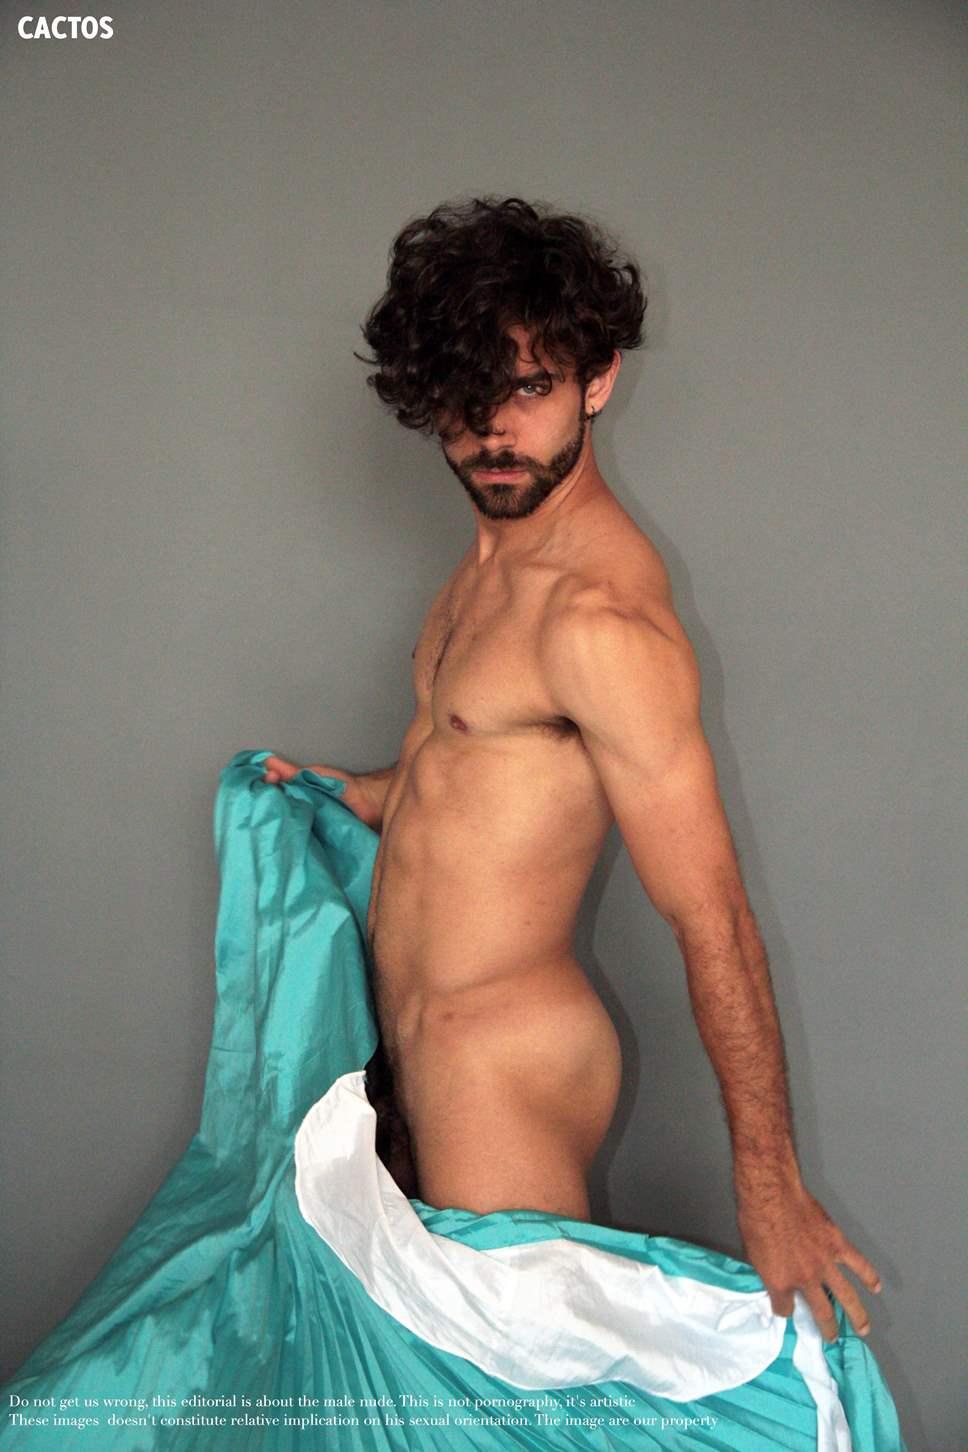 Filipe Robbe para Cactos Magazine